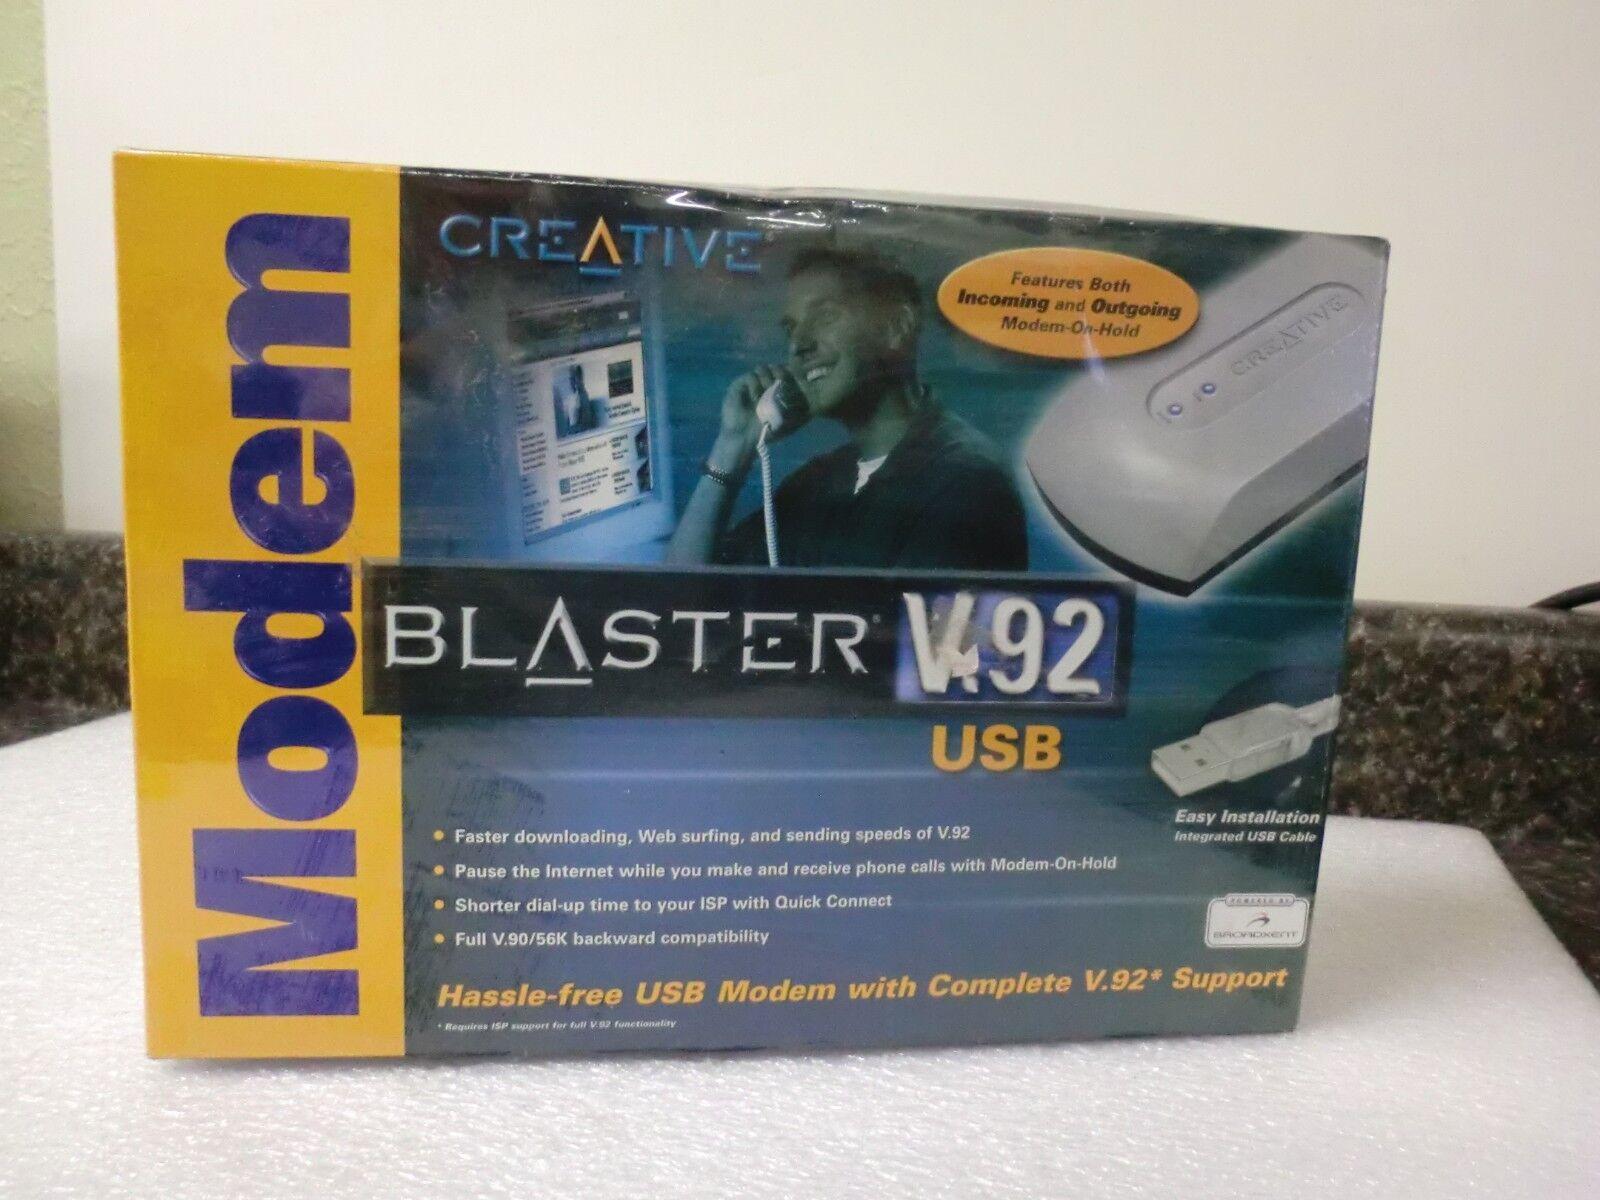 CREATIVE Modem V.92 USB Driver for Windows Mac